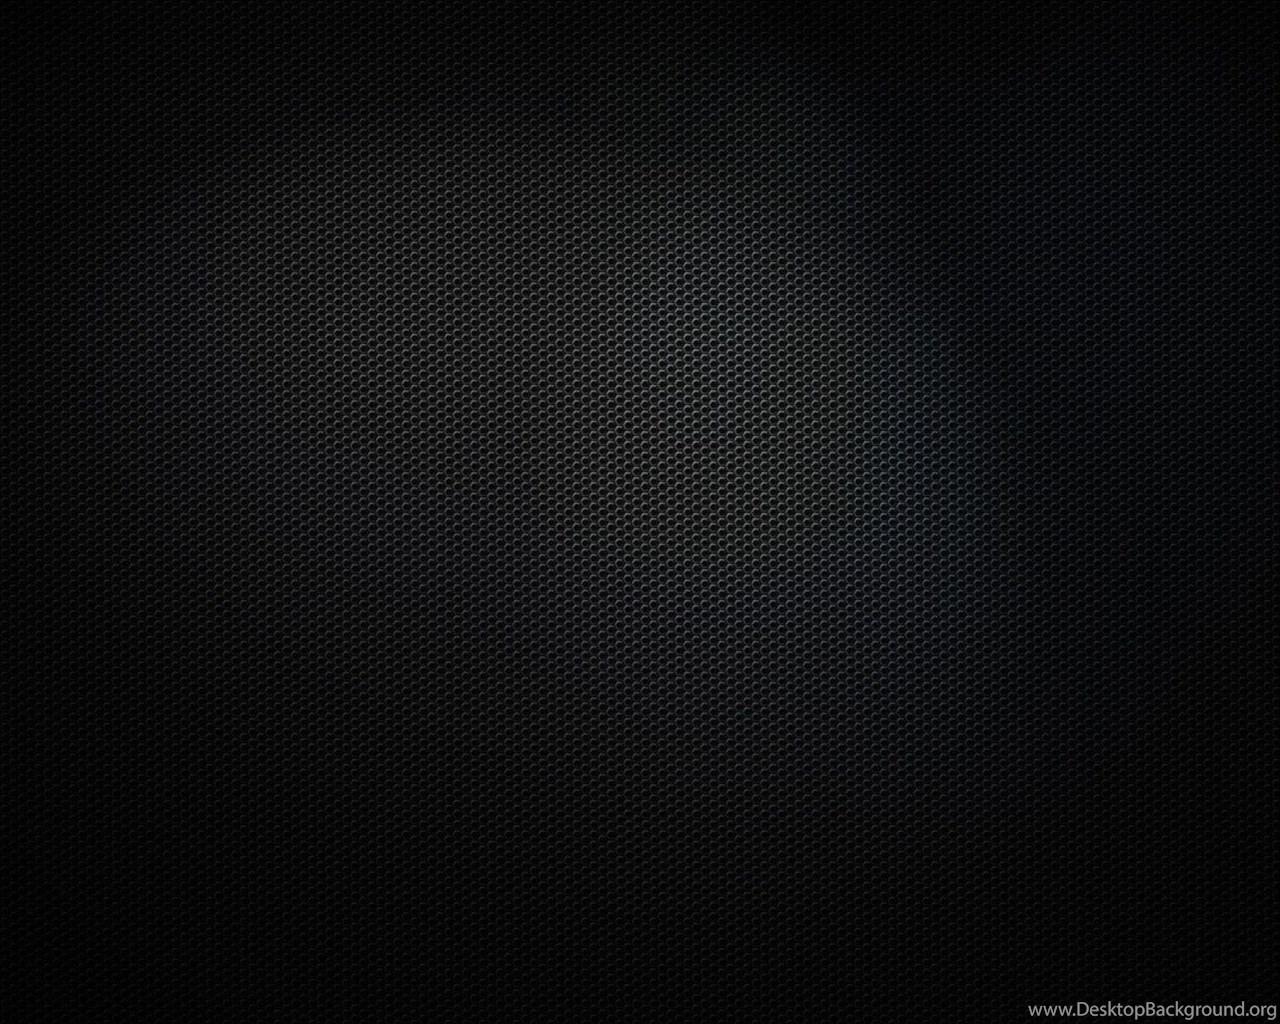 dark website backgrounds wallpapers » walldevil best free hd